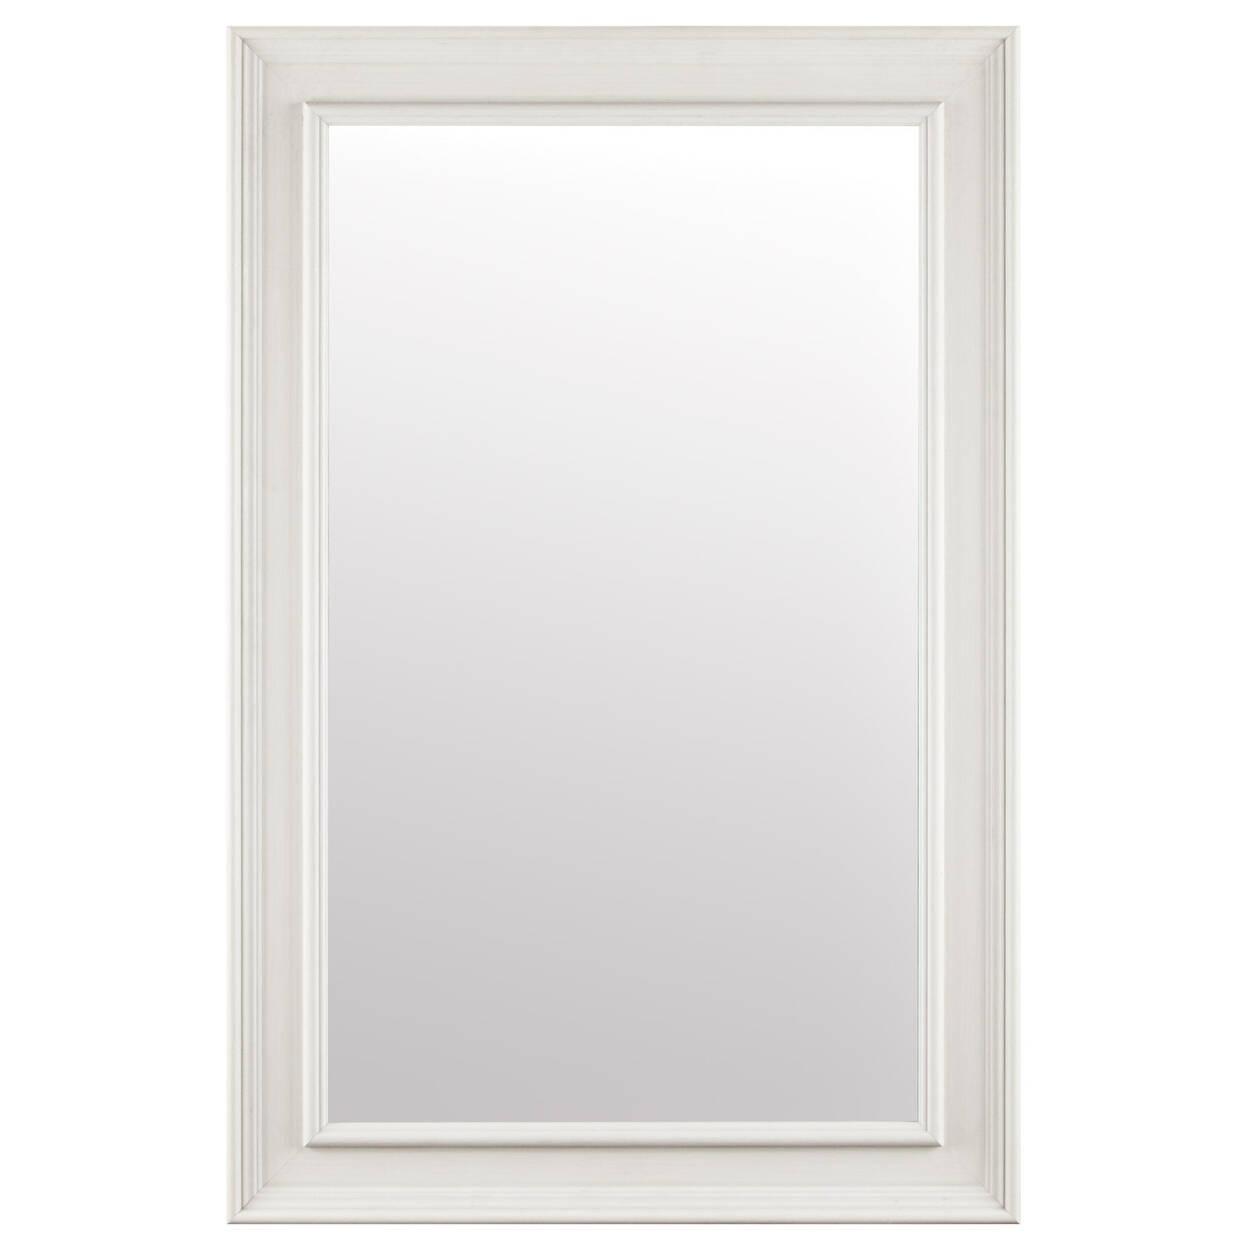 Whitewashed Wood Mirror